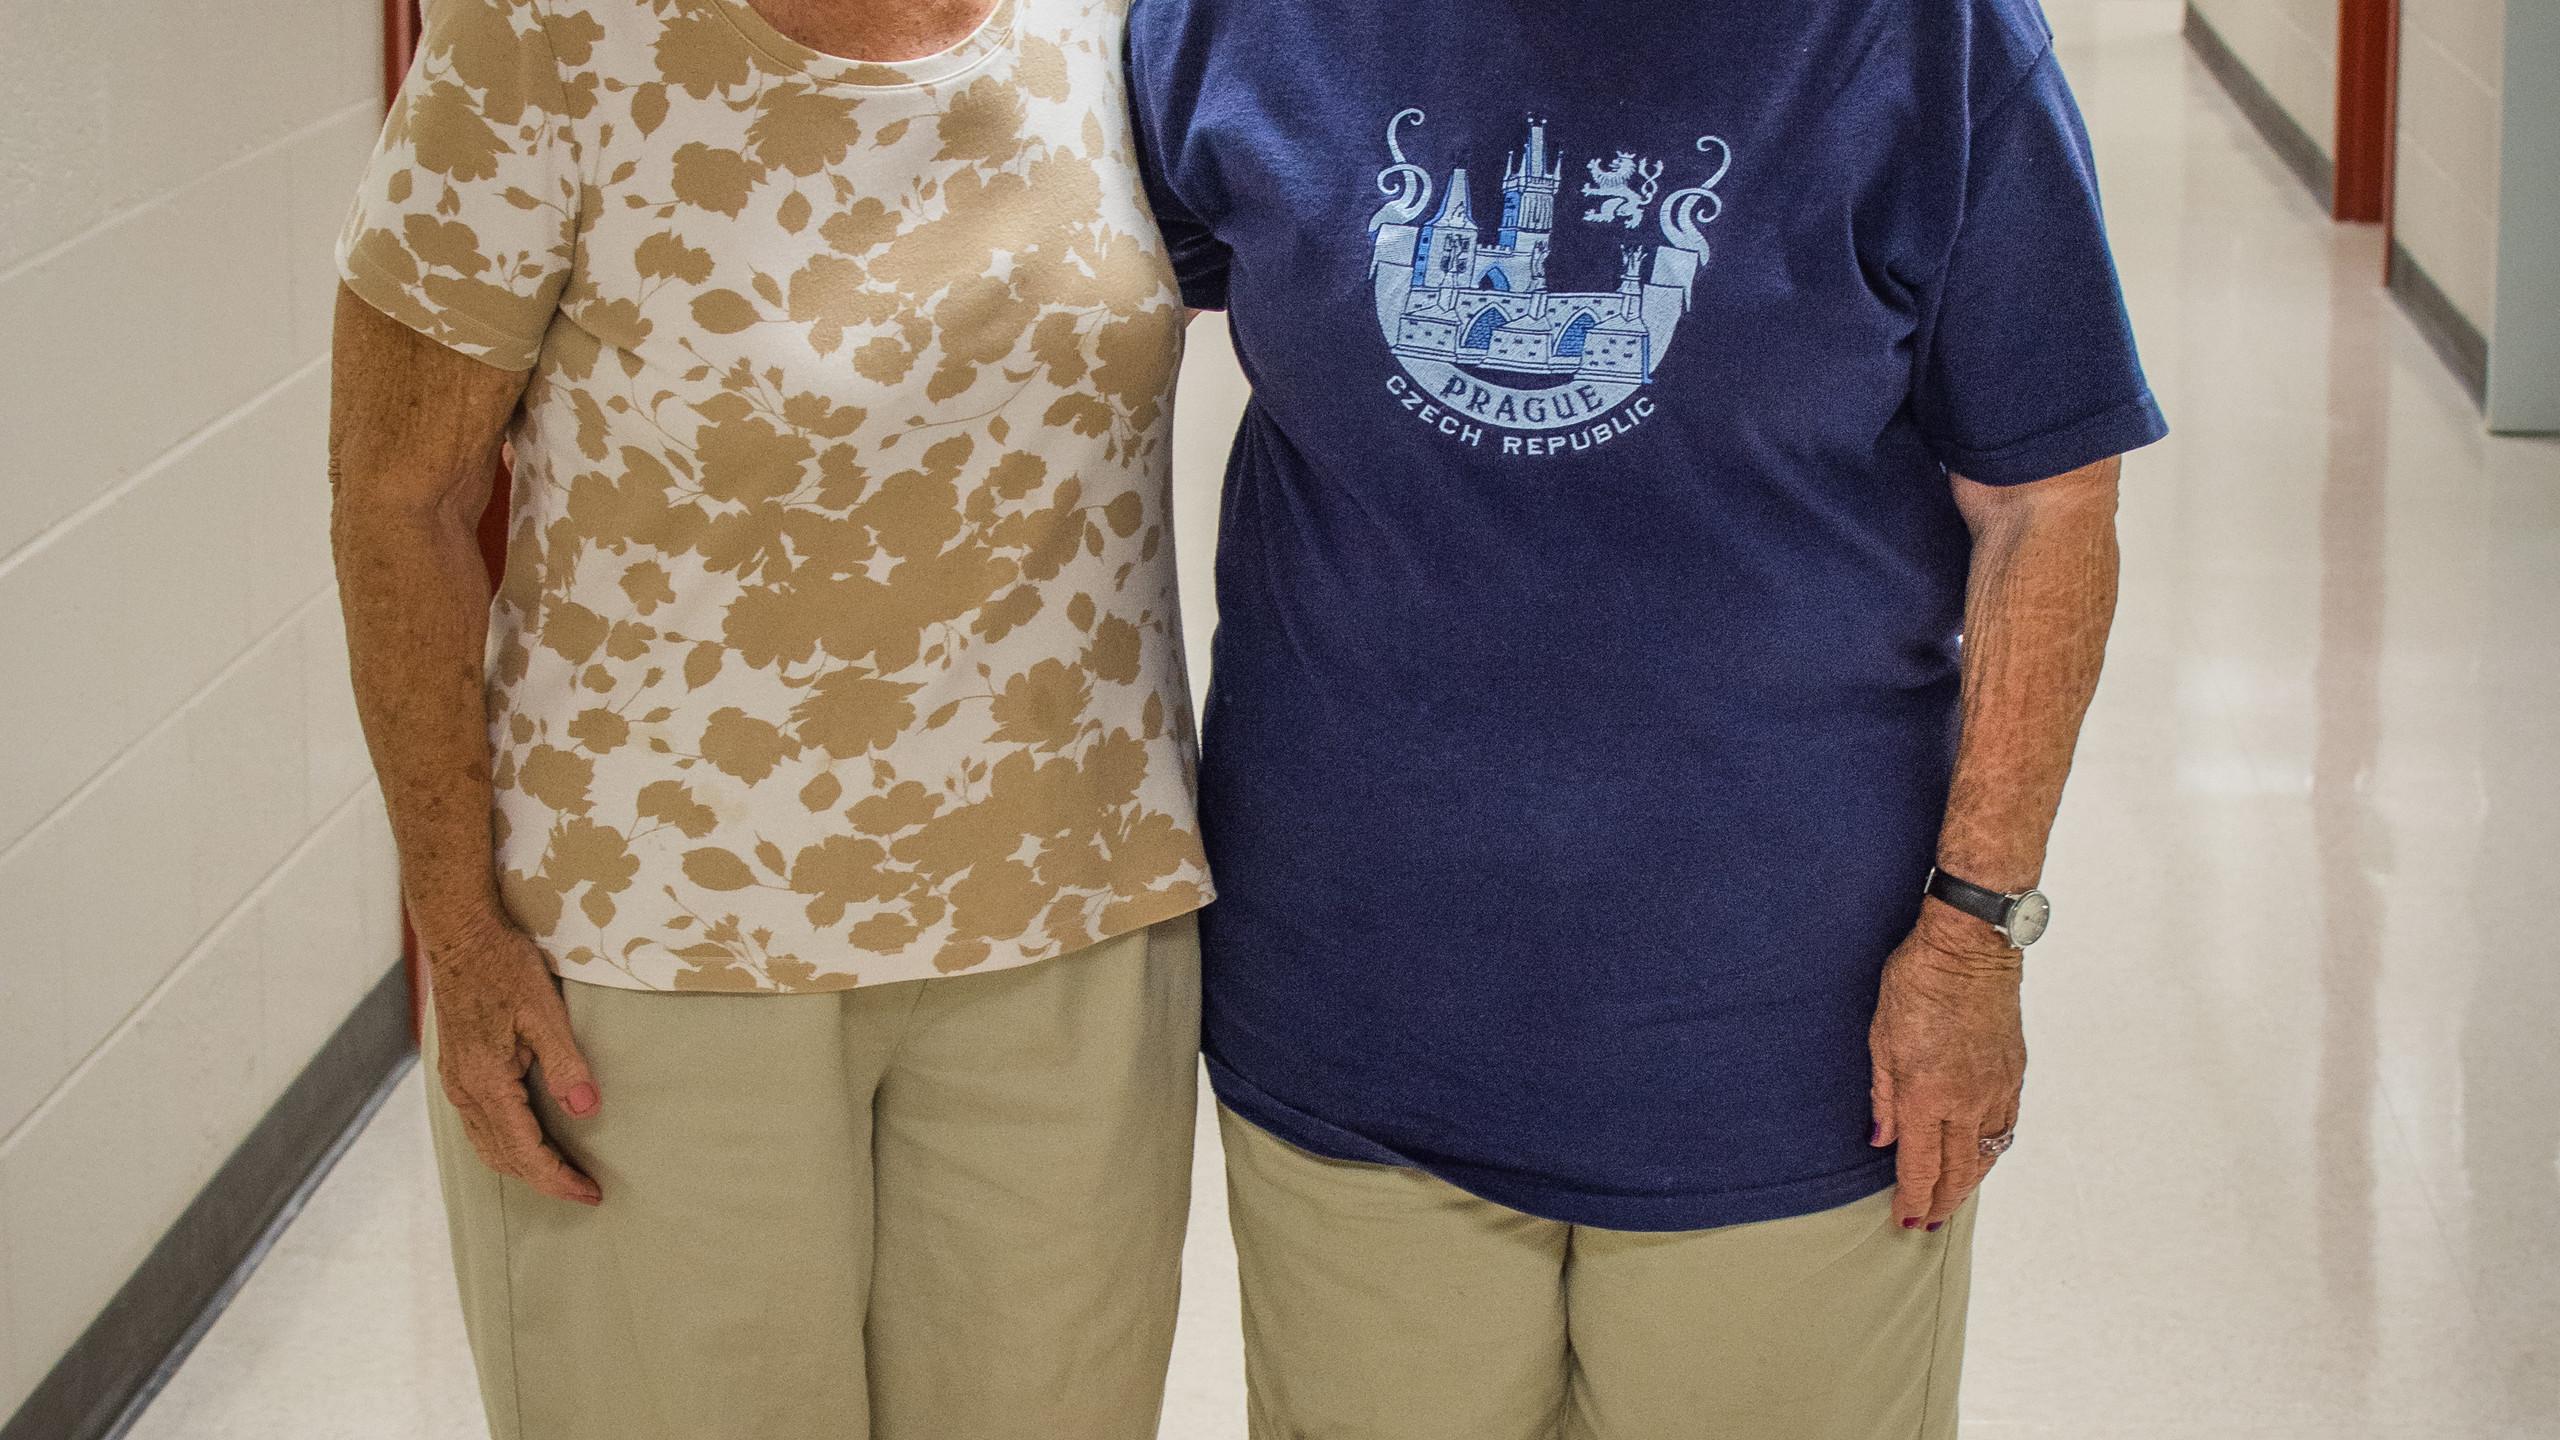 Carol Dodenhoff and Betsy Williams